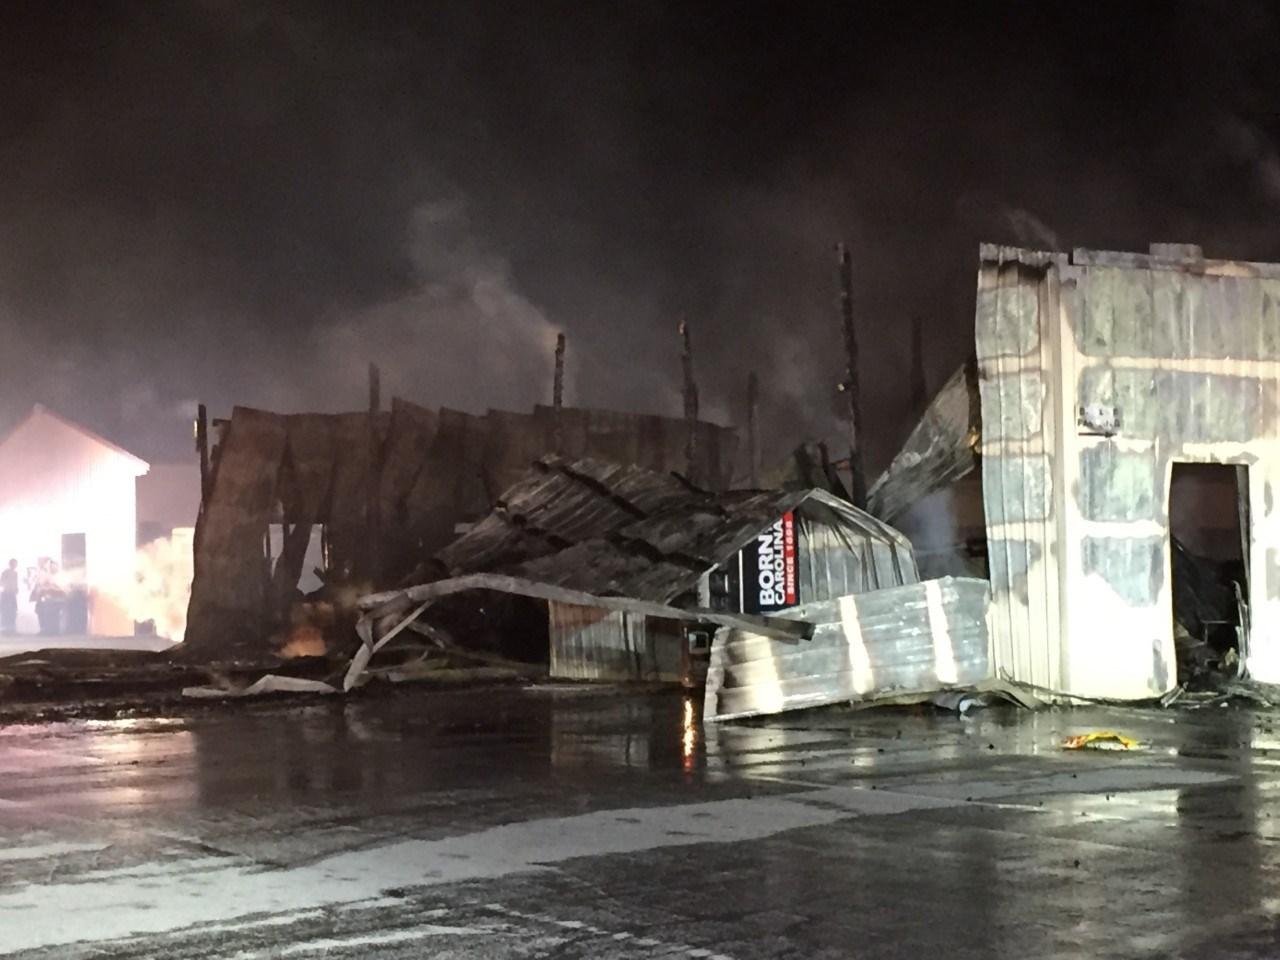 Firefighters battle blaze at Greer flea market (FOX Carolina: 11/12/2016).